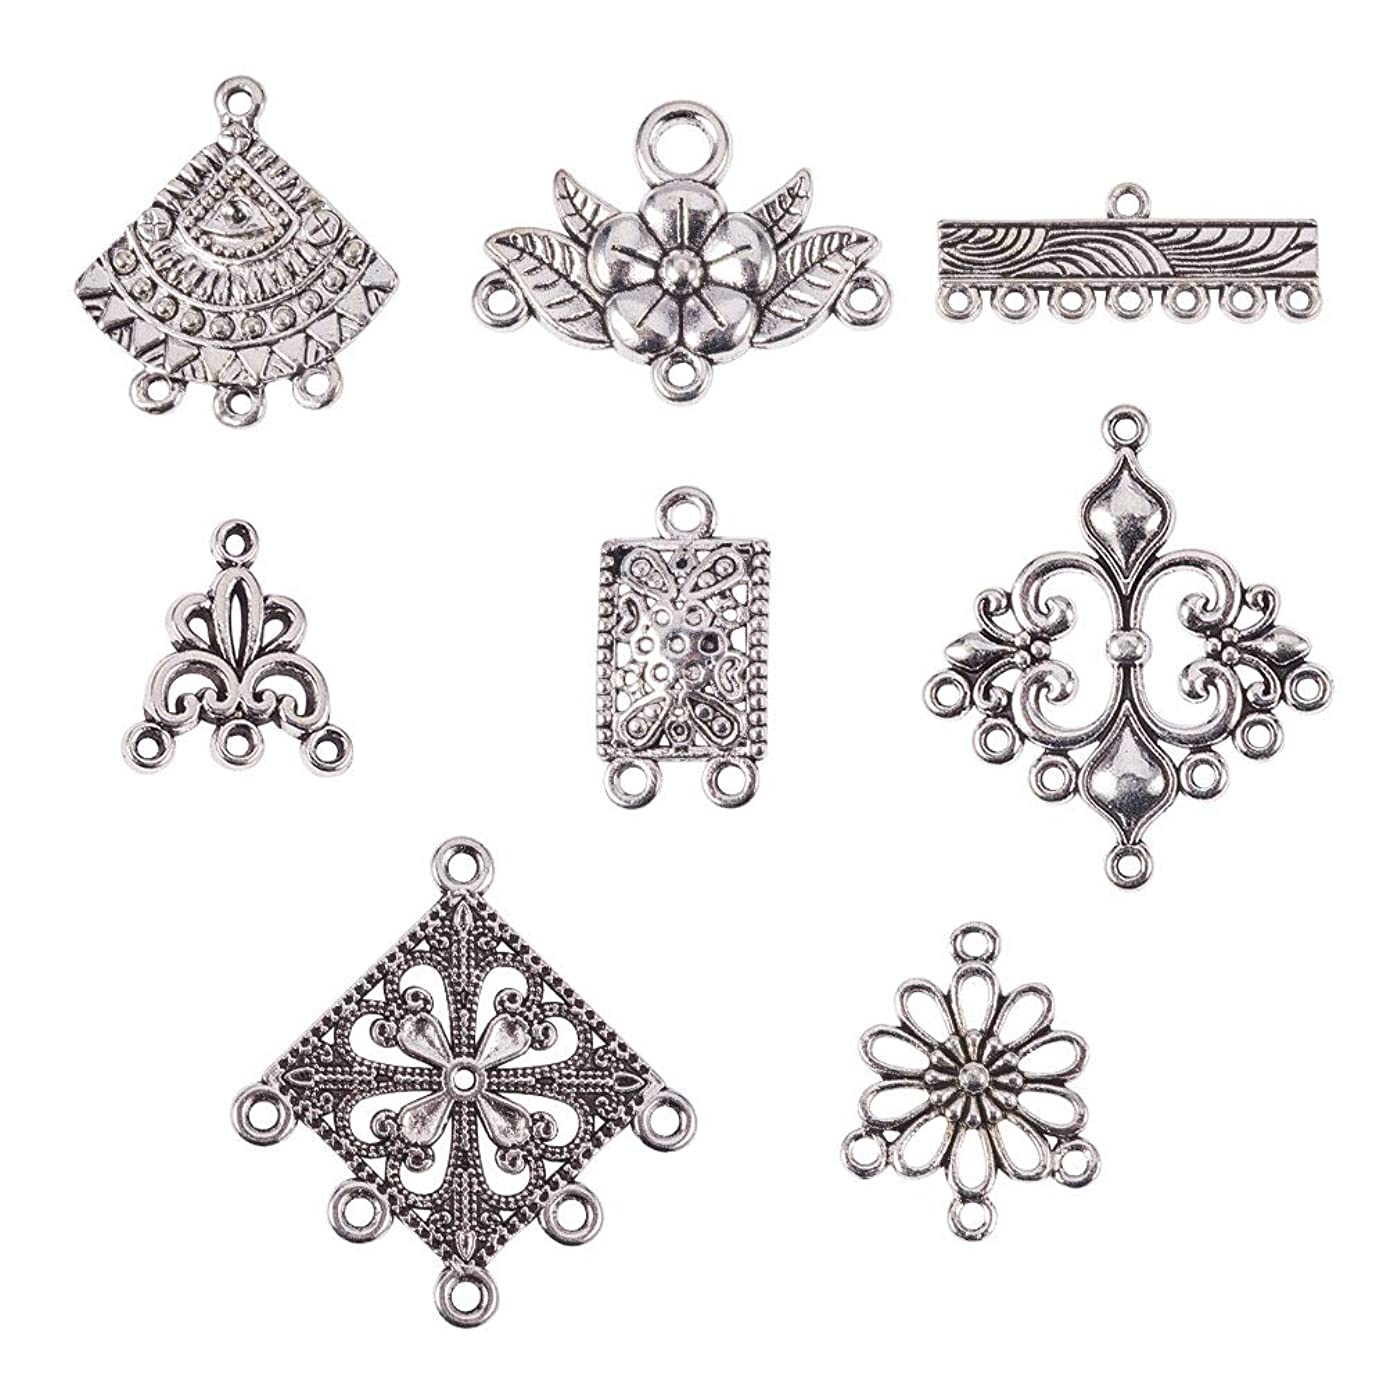 PandaHall Elite 120 pcs 8 Shapes Tibetan Style Chandelier Component Links Charm Pendant Connectors for Earring DIY Jewelry Making, Antique Silver